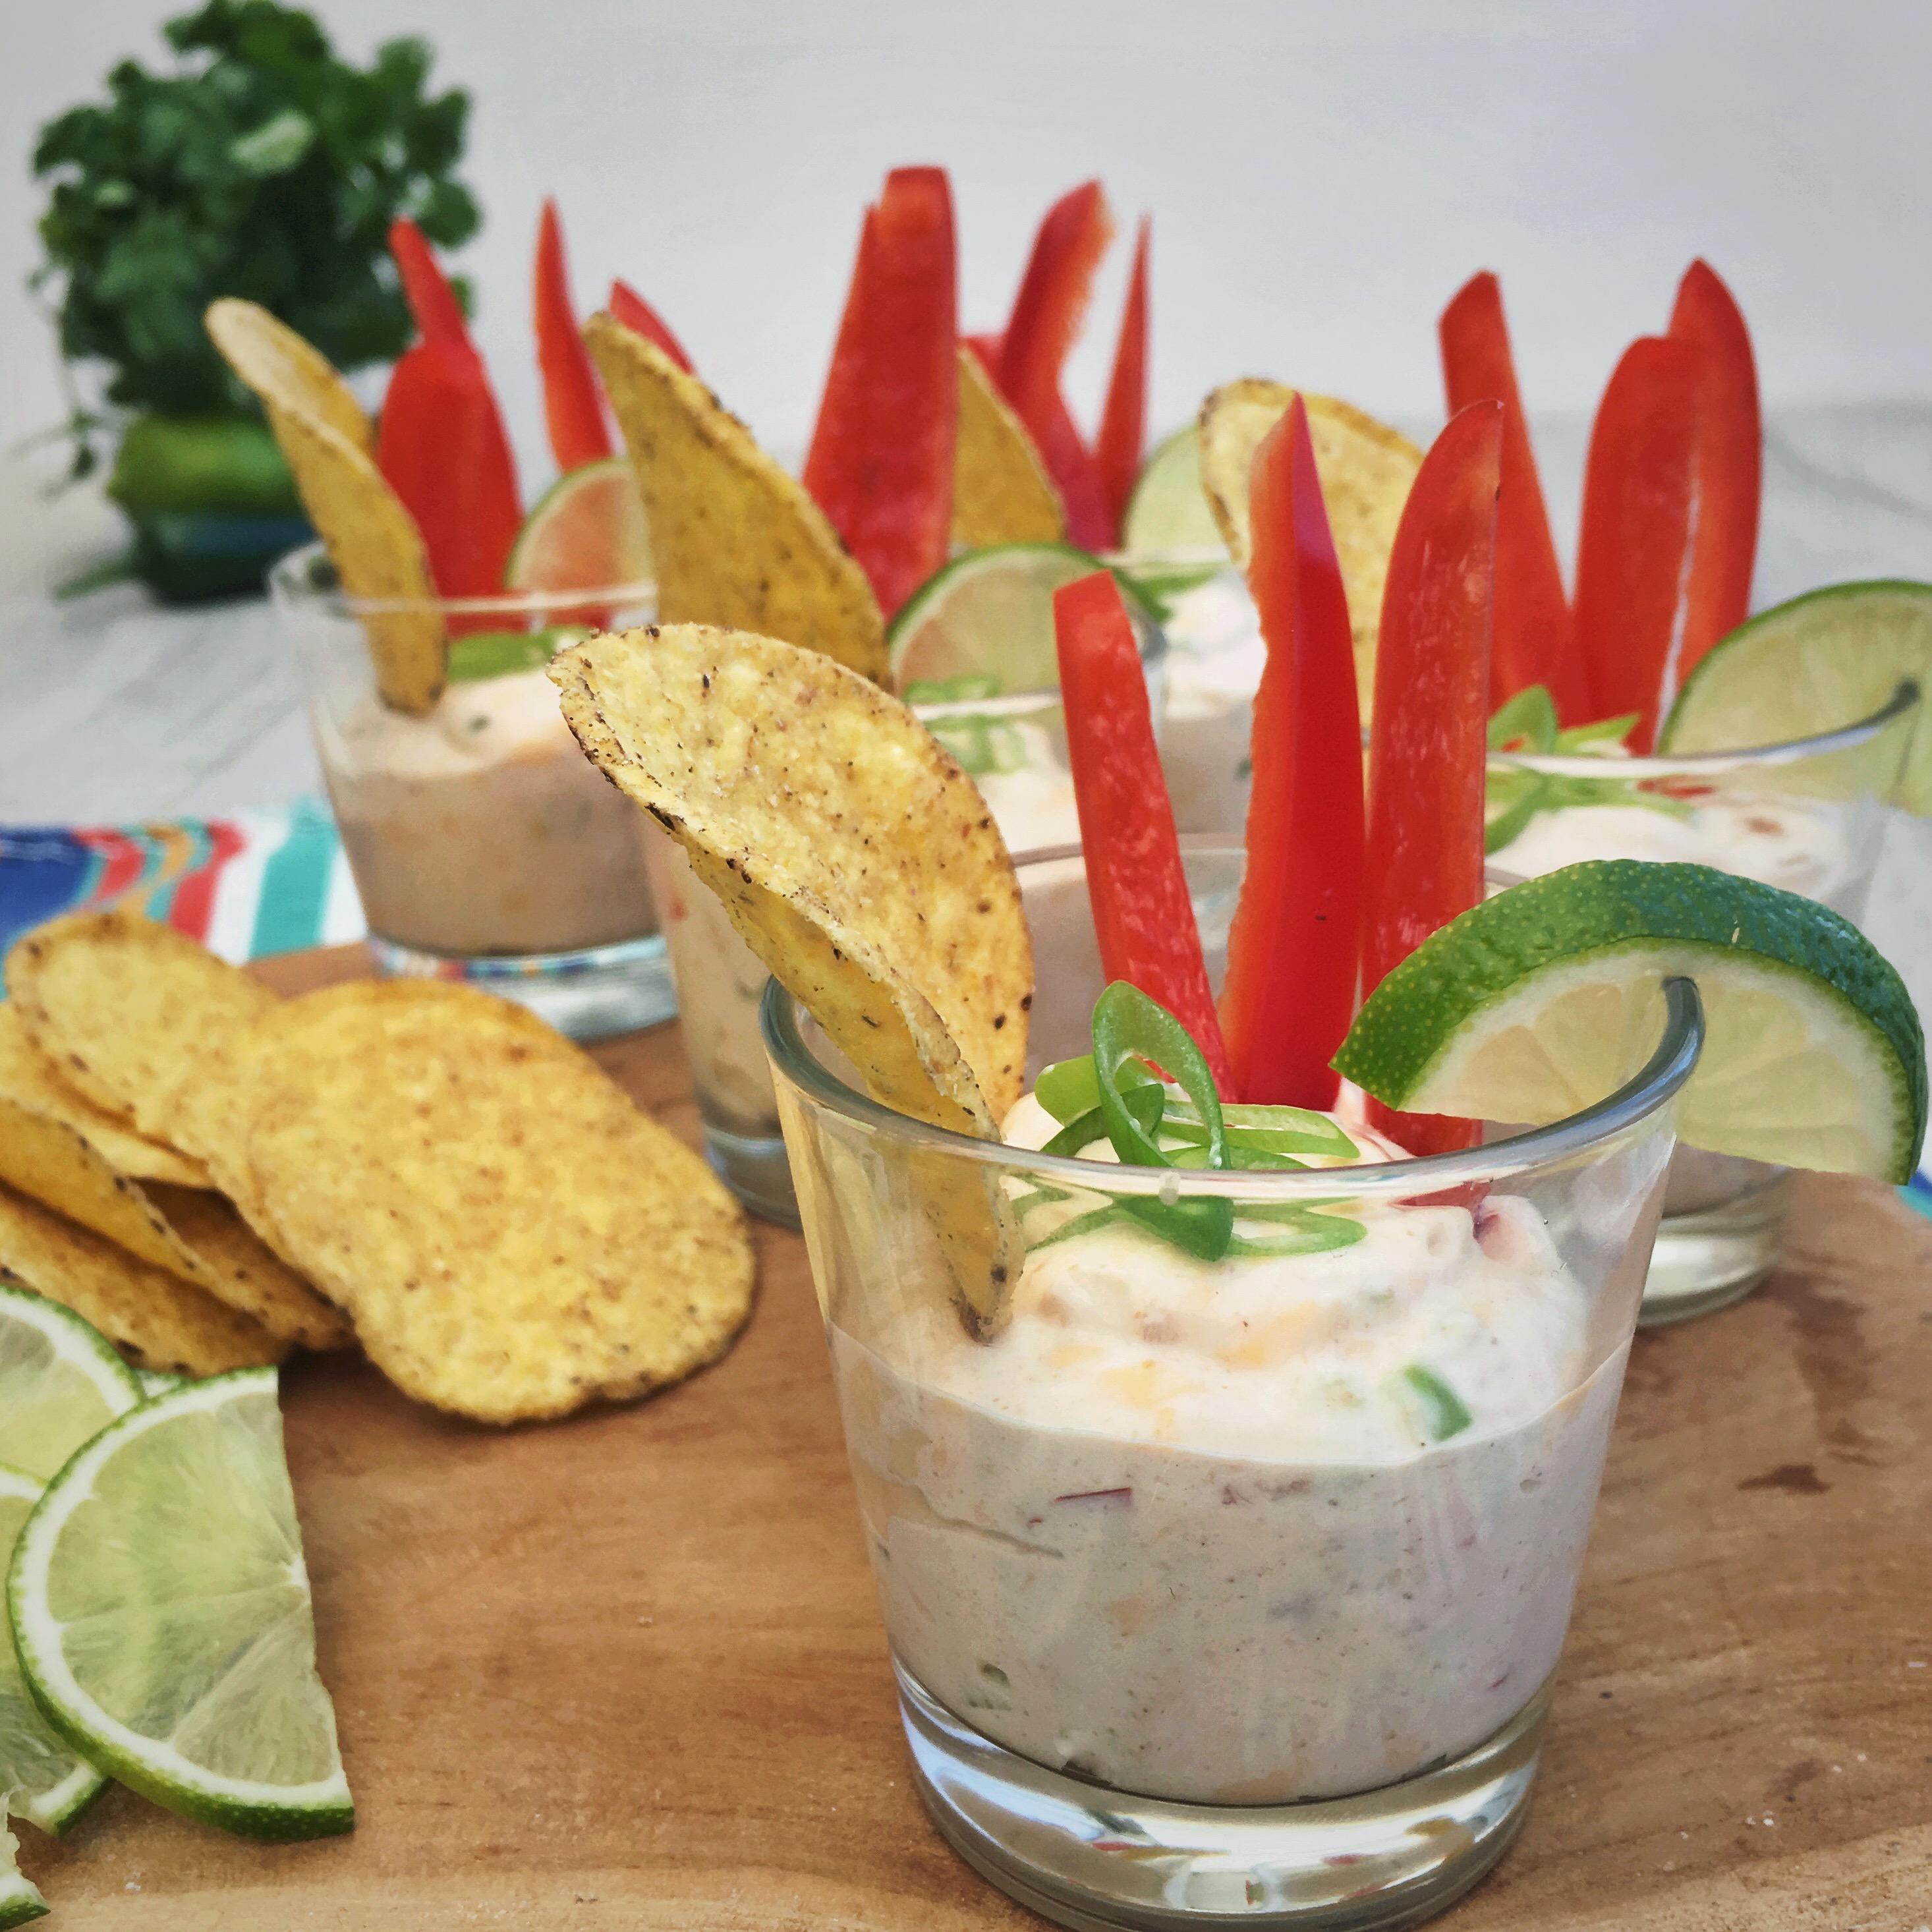 Roomkaas nacho dip